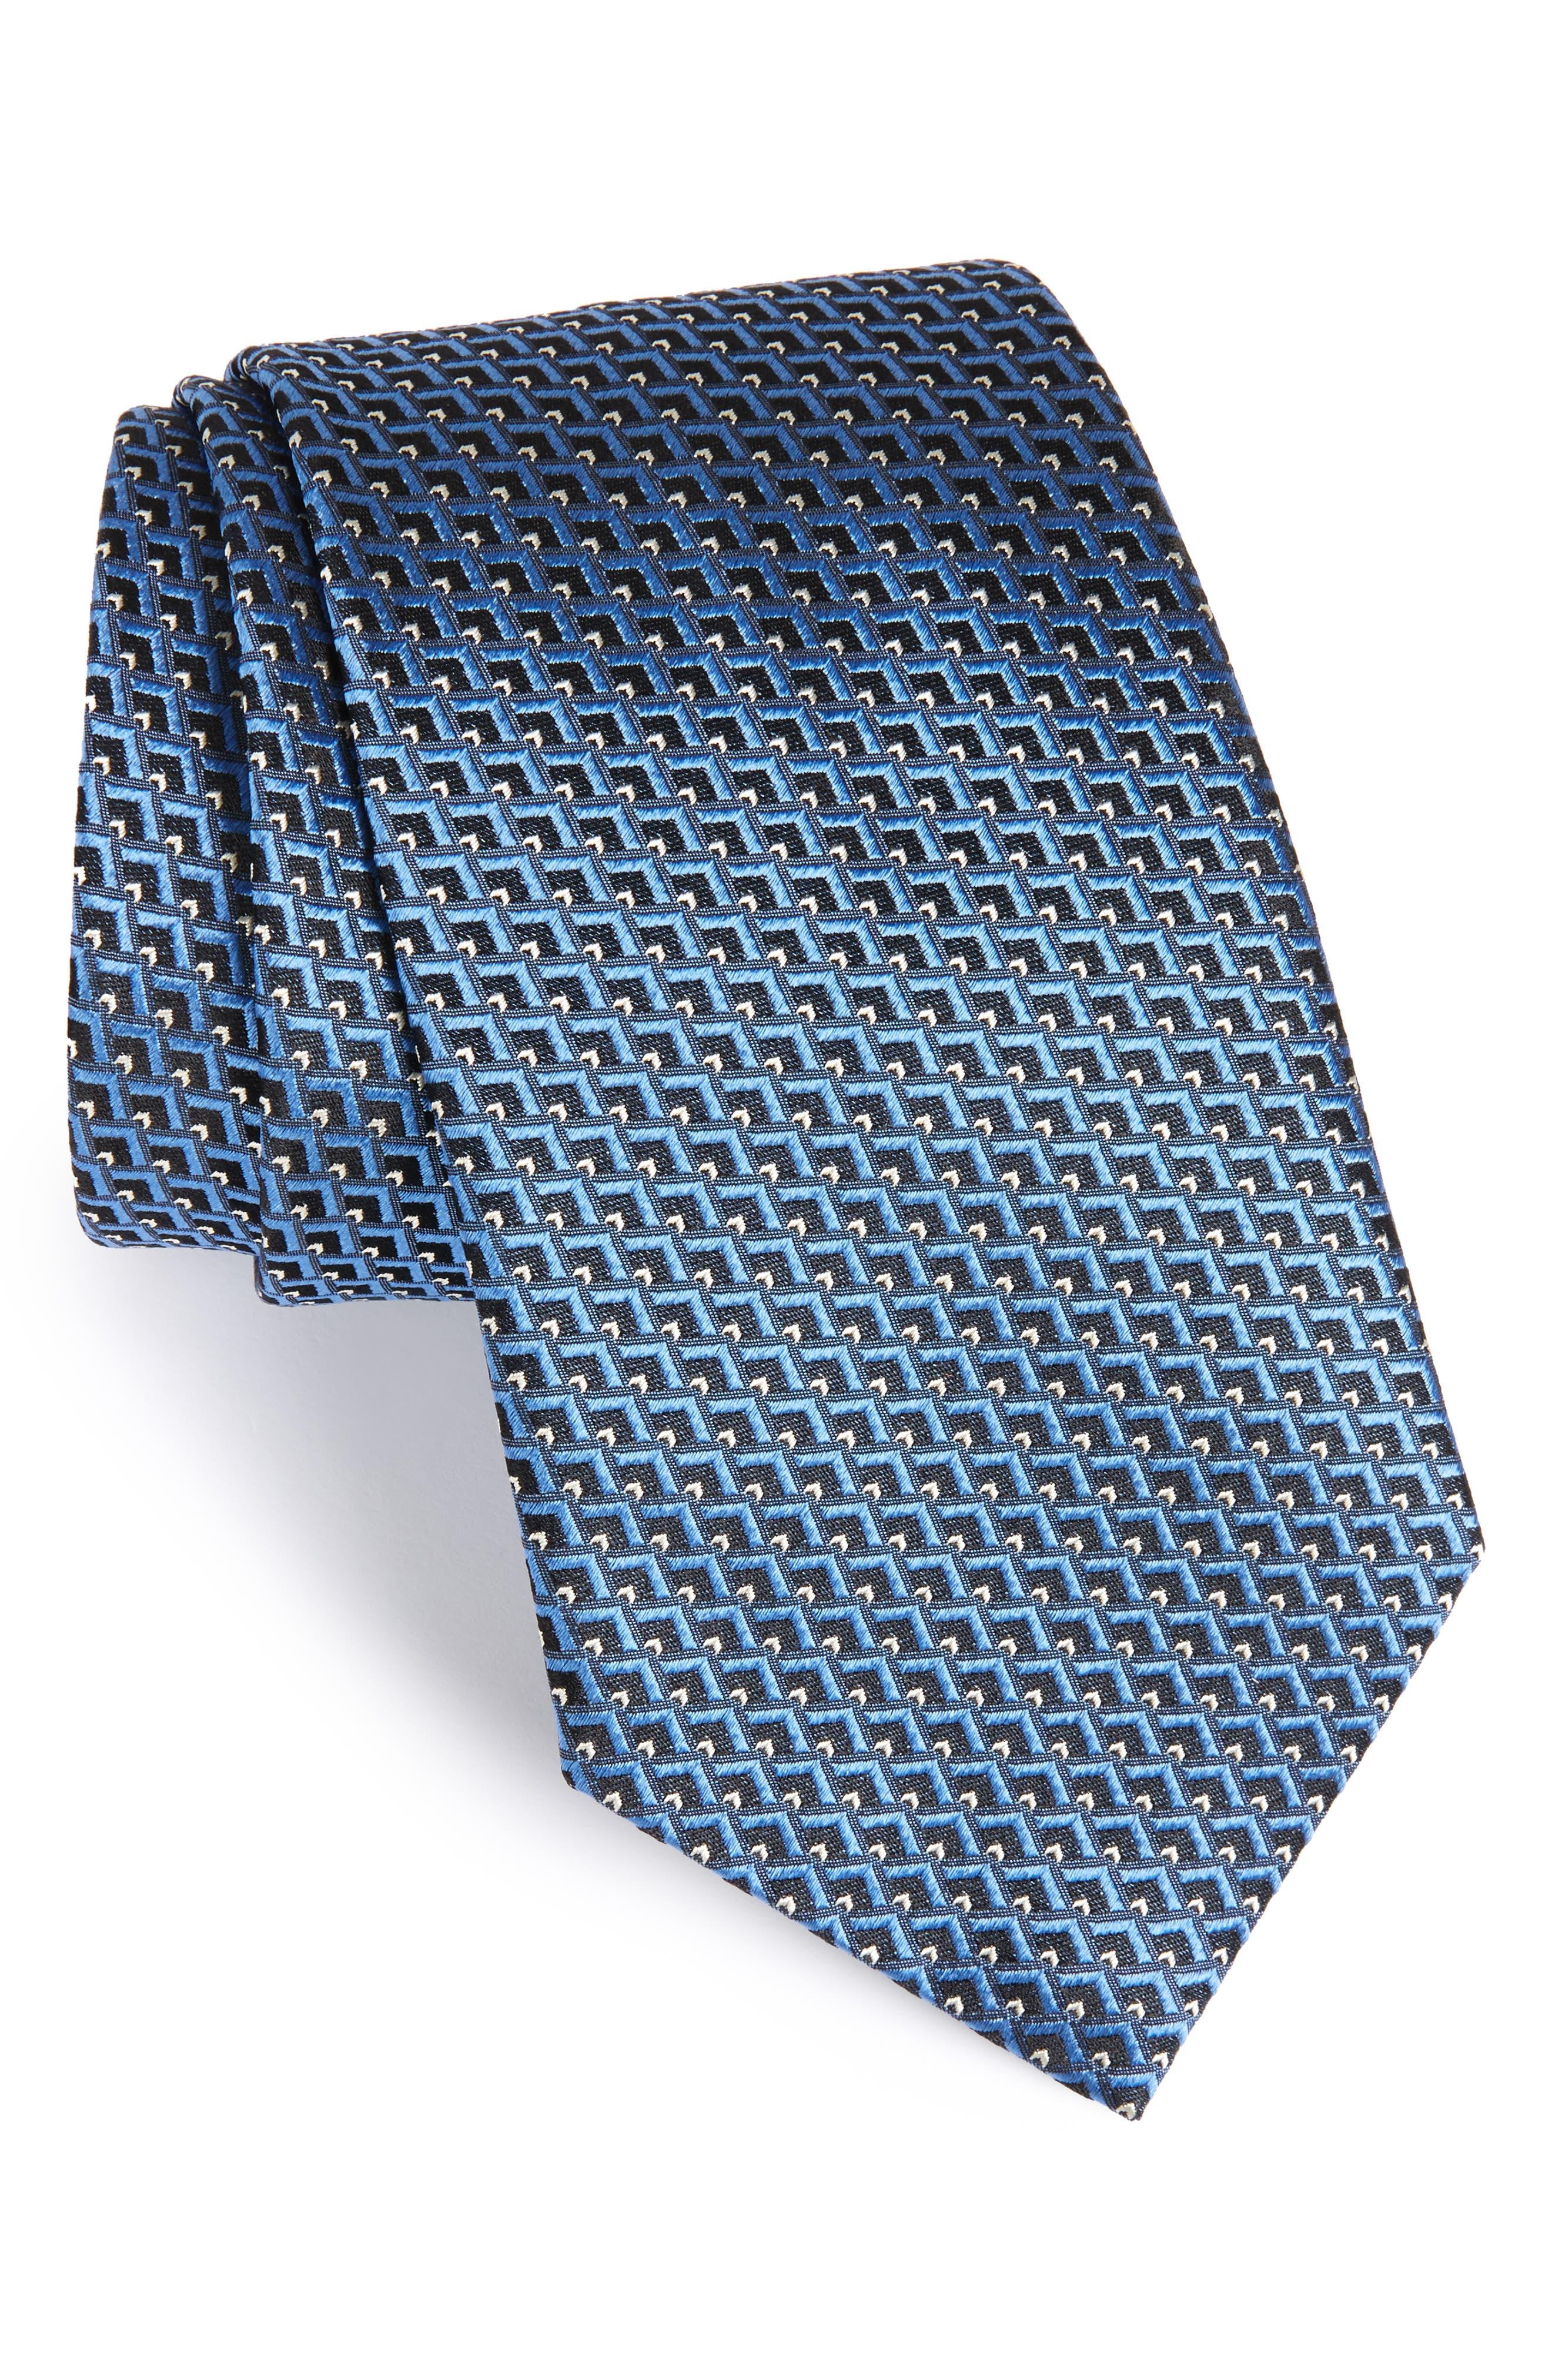 Geomeric Silk Tie,                             Main thumbnail 1, color,                             Navy